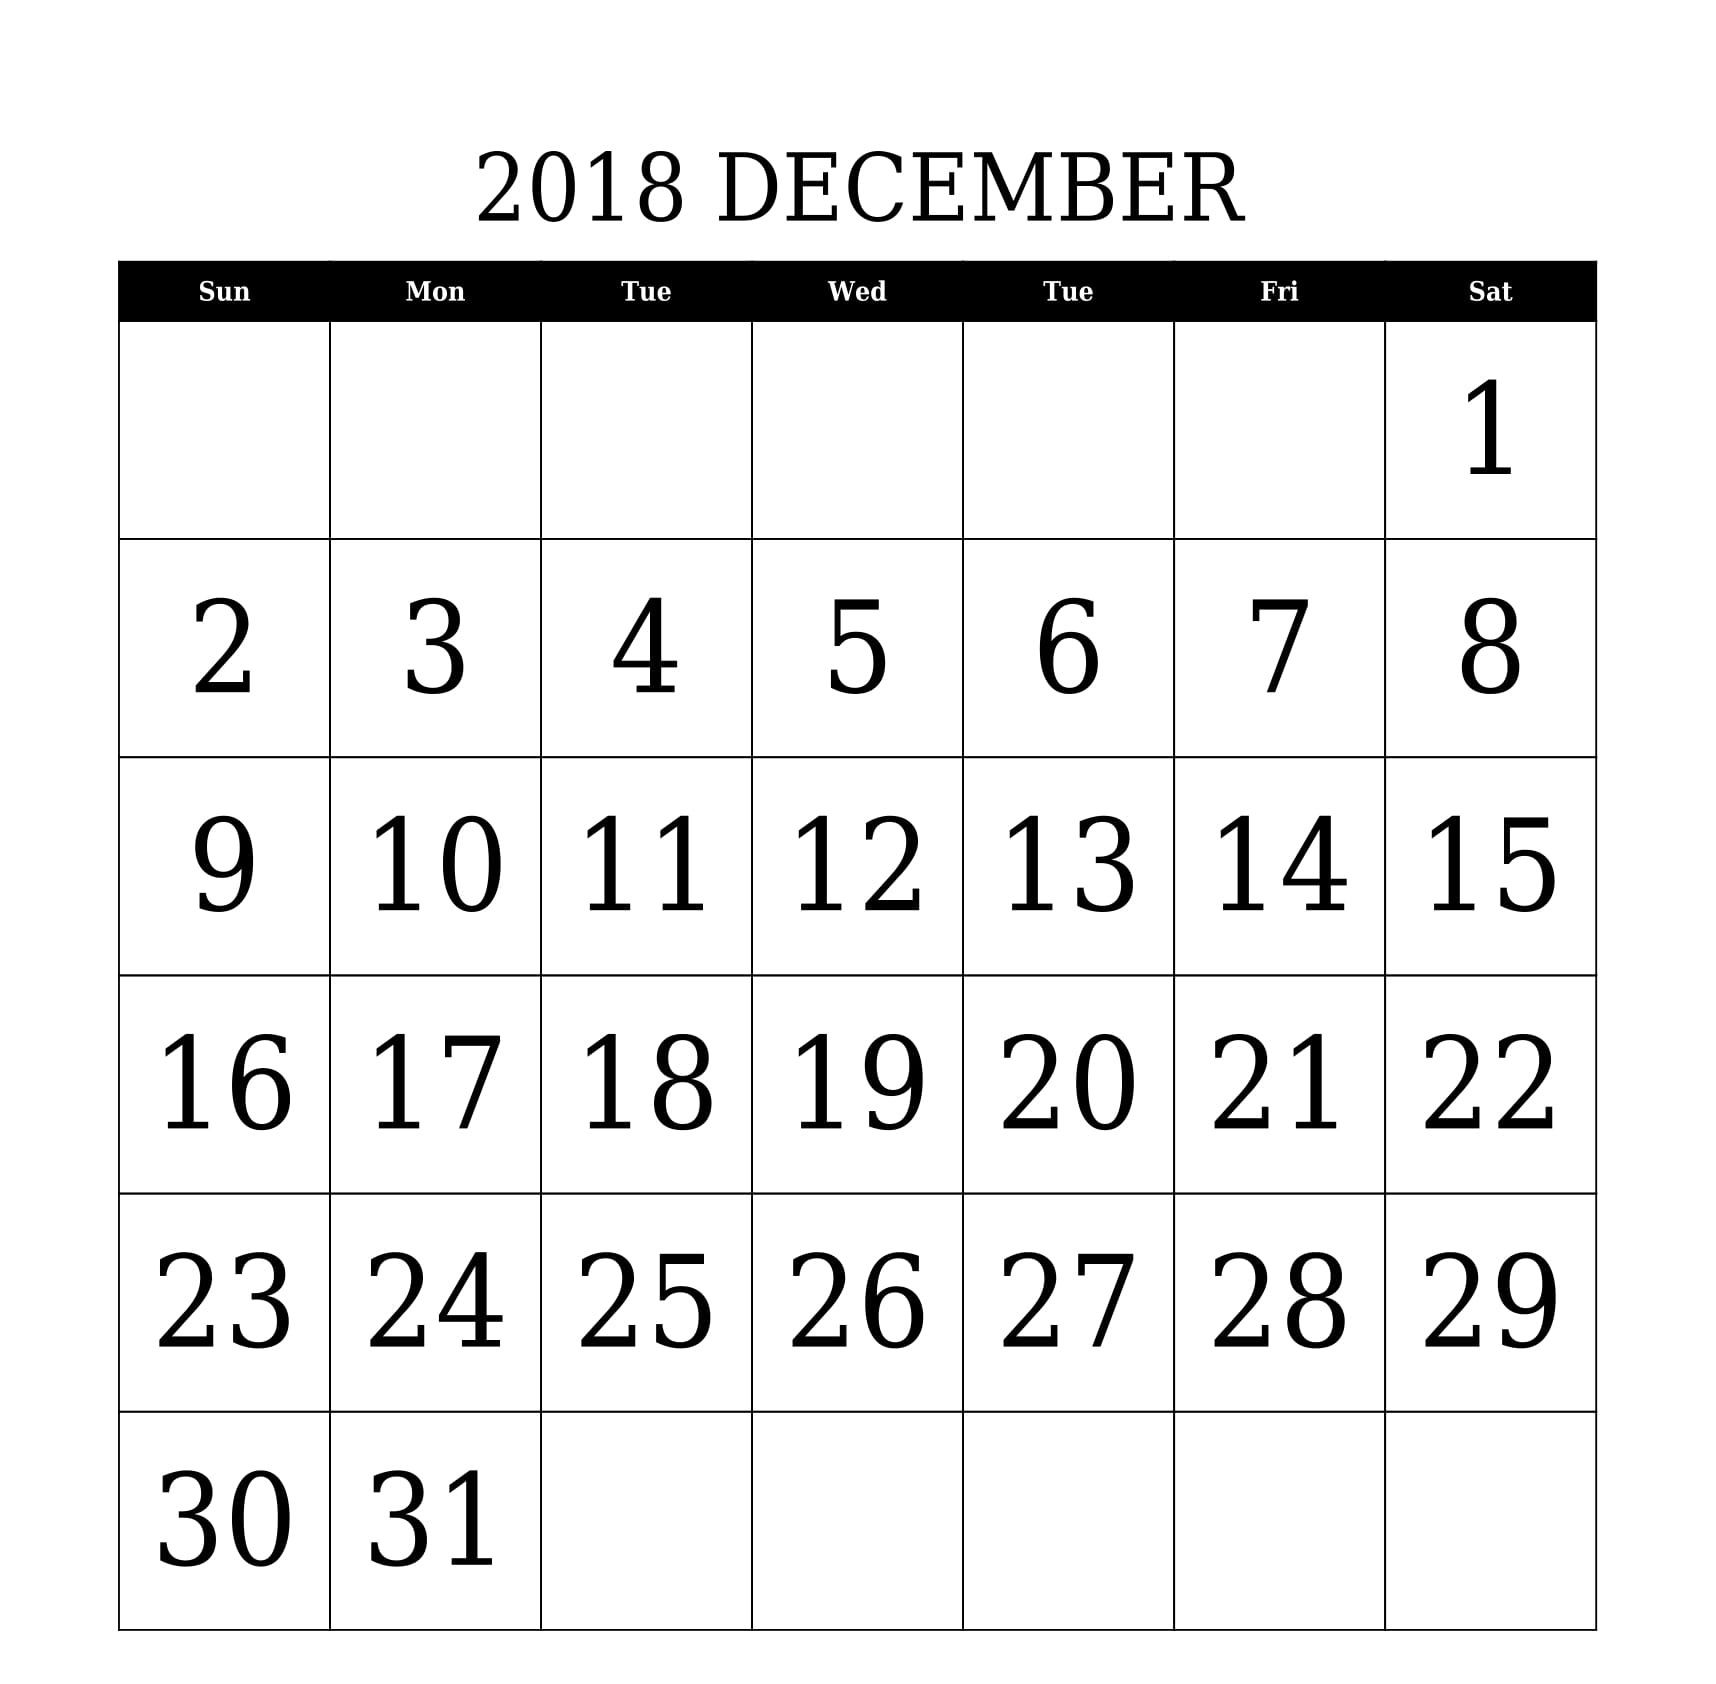 december 2018 calendar printable large date font size template